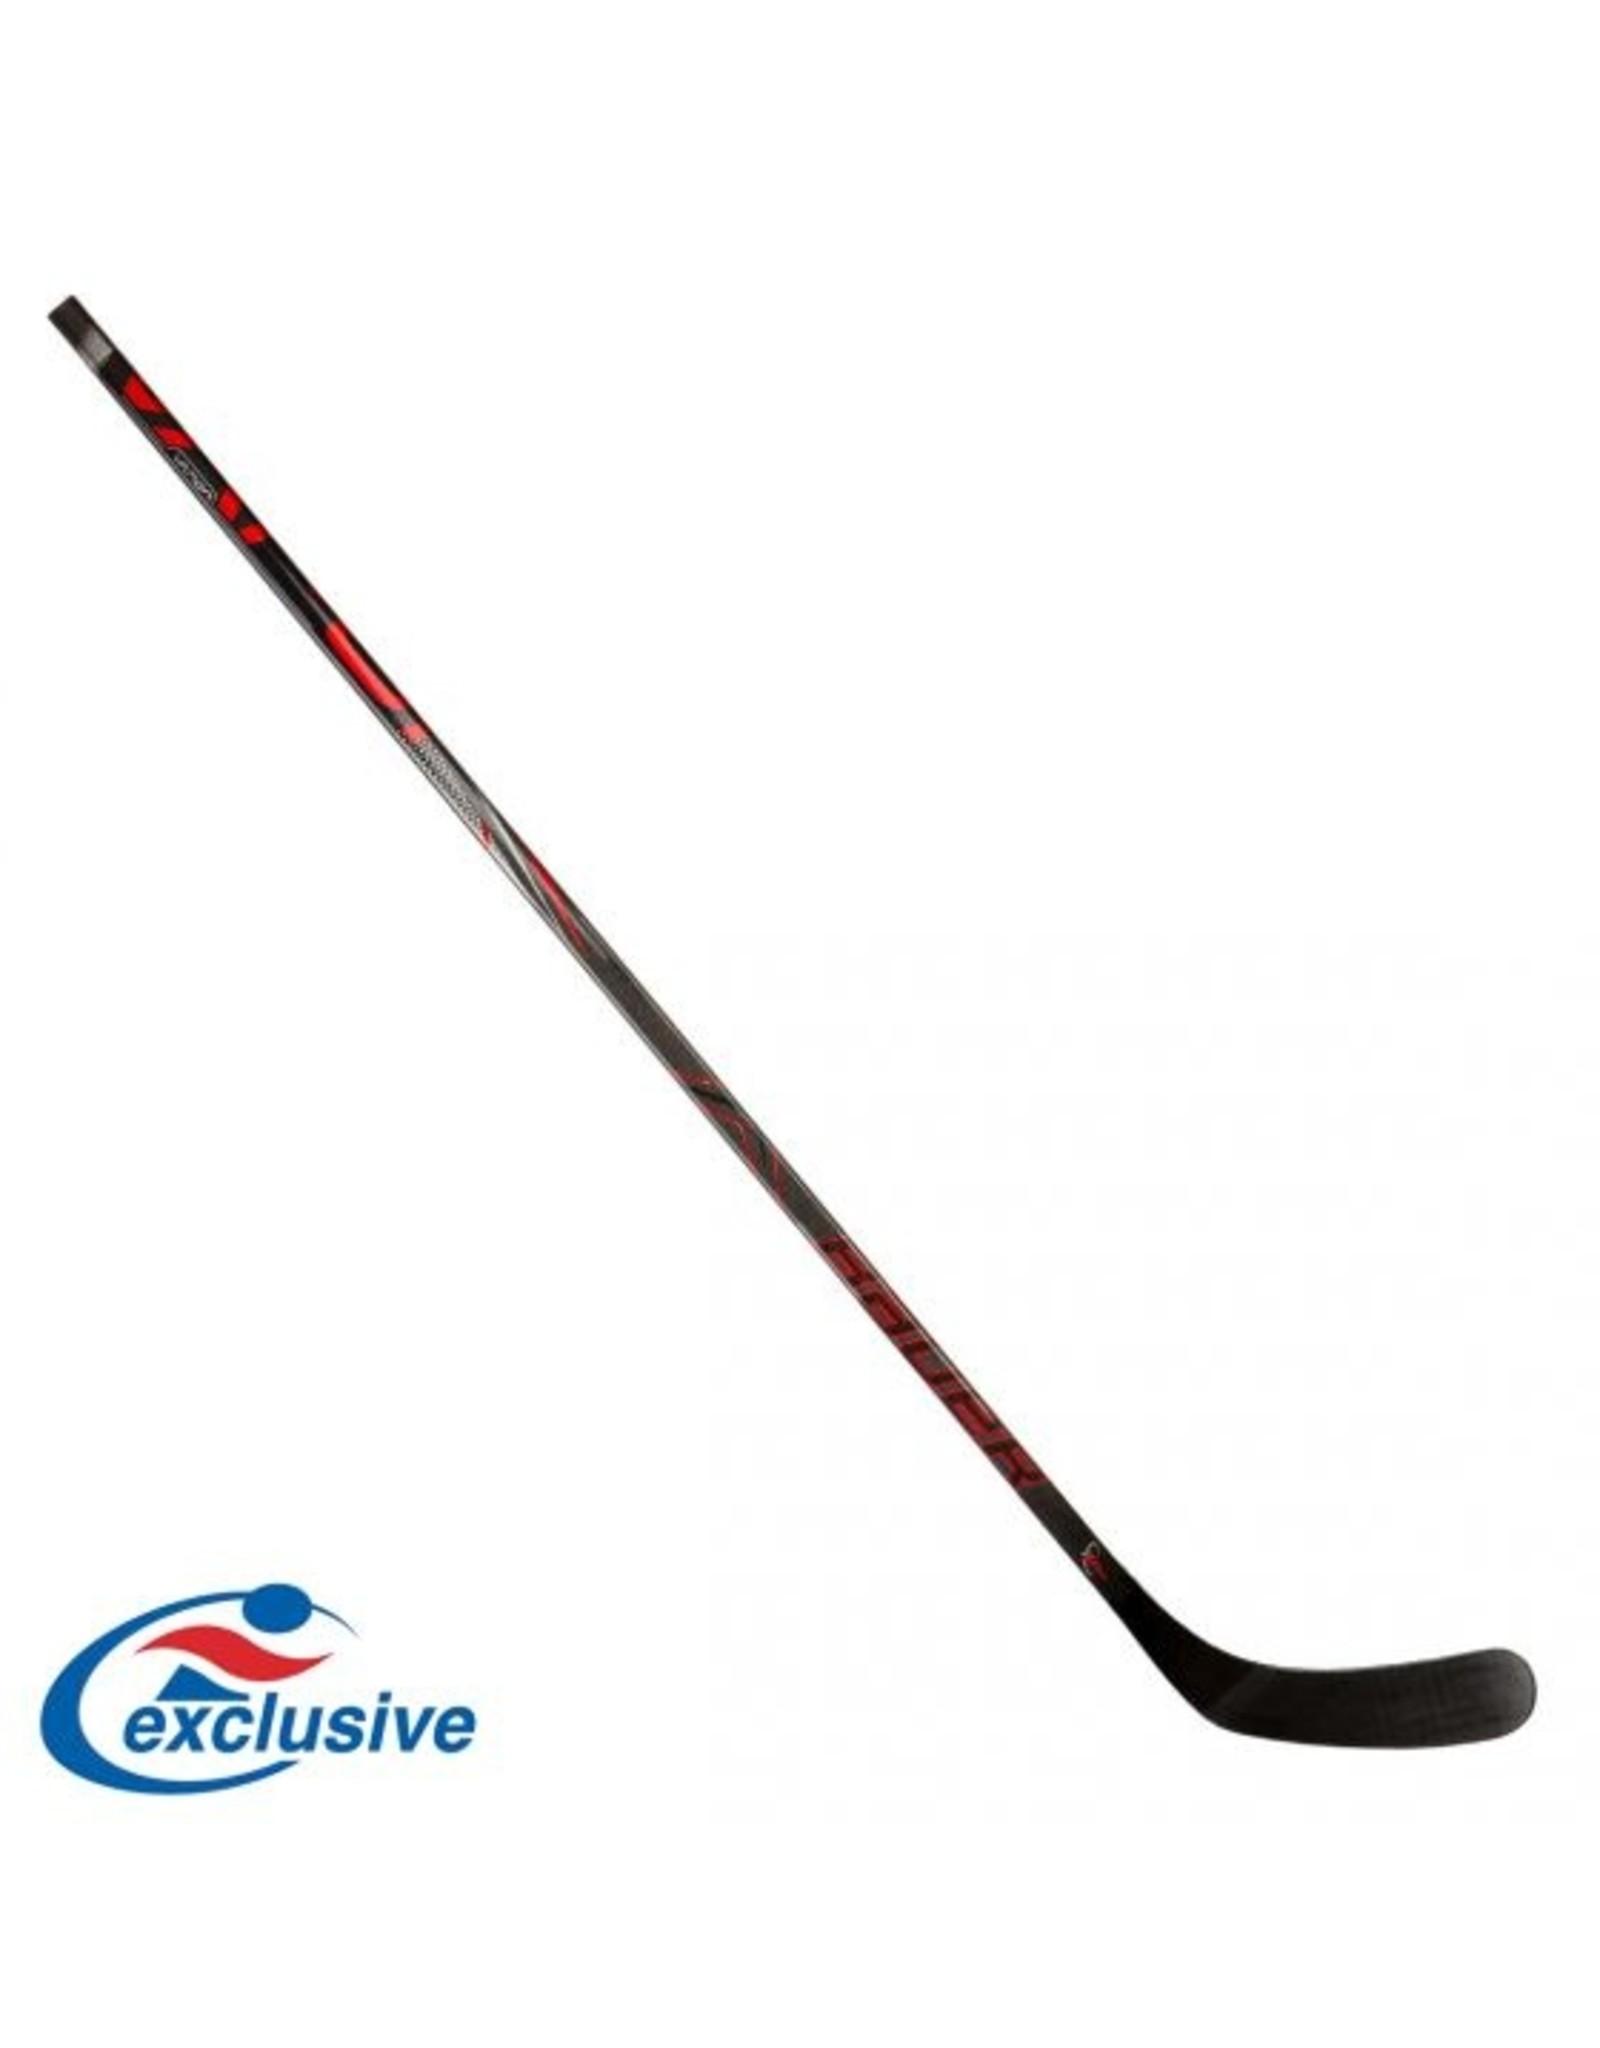 Bauer Hockey - Canada BAUER S19 VAPOR VLTX PRO+ INT OPS